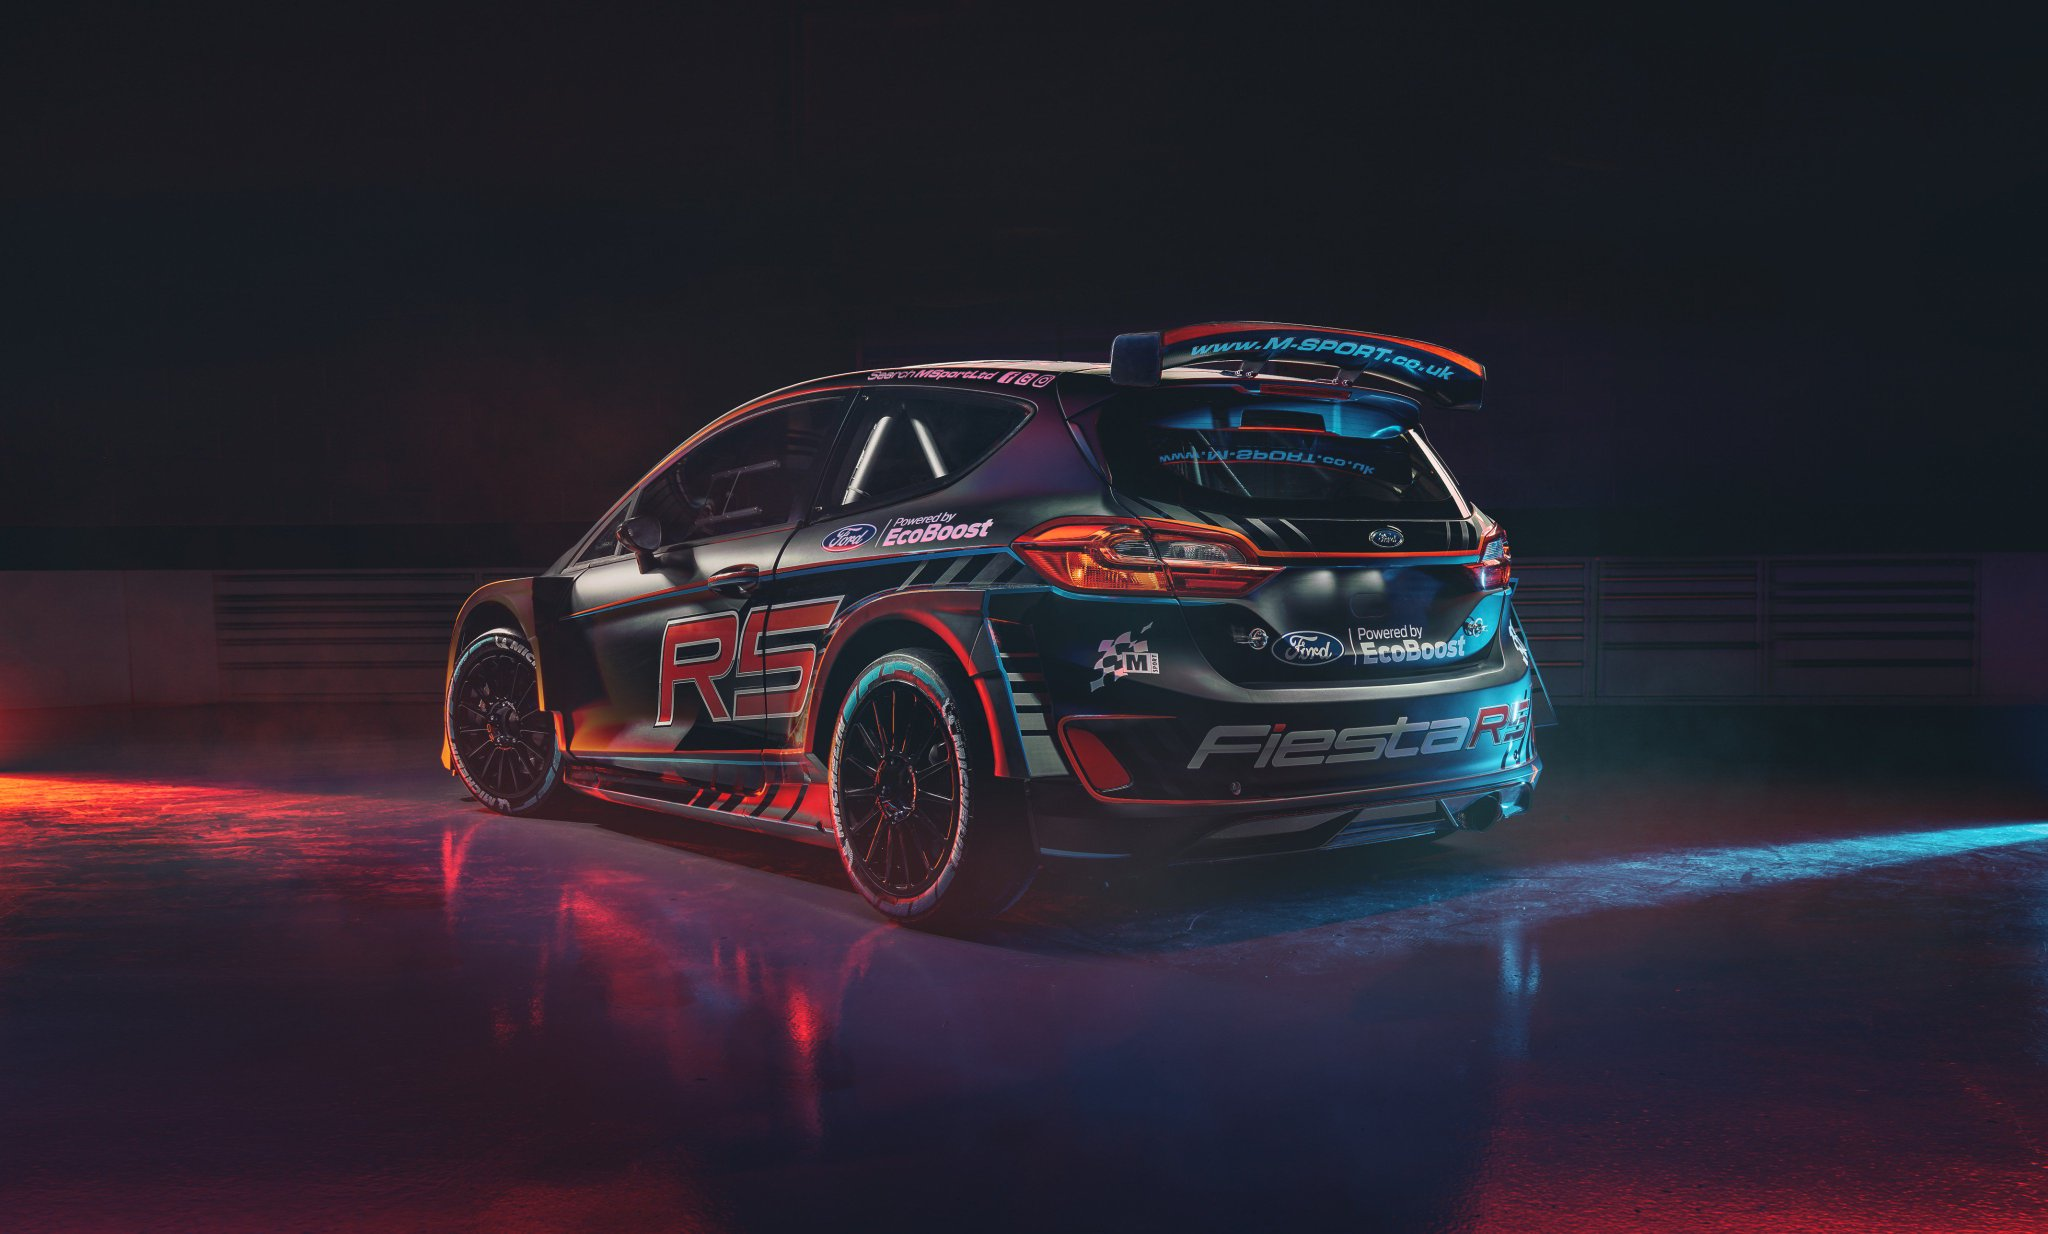 World Rally Championship: Temporada 2019 - Página 25 D8dwUihXUAEOBUH